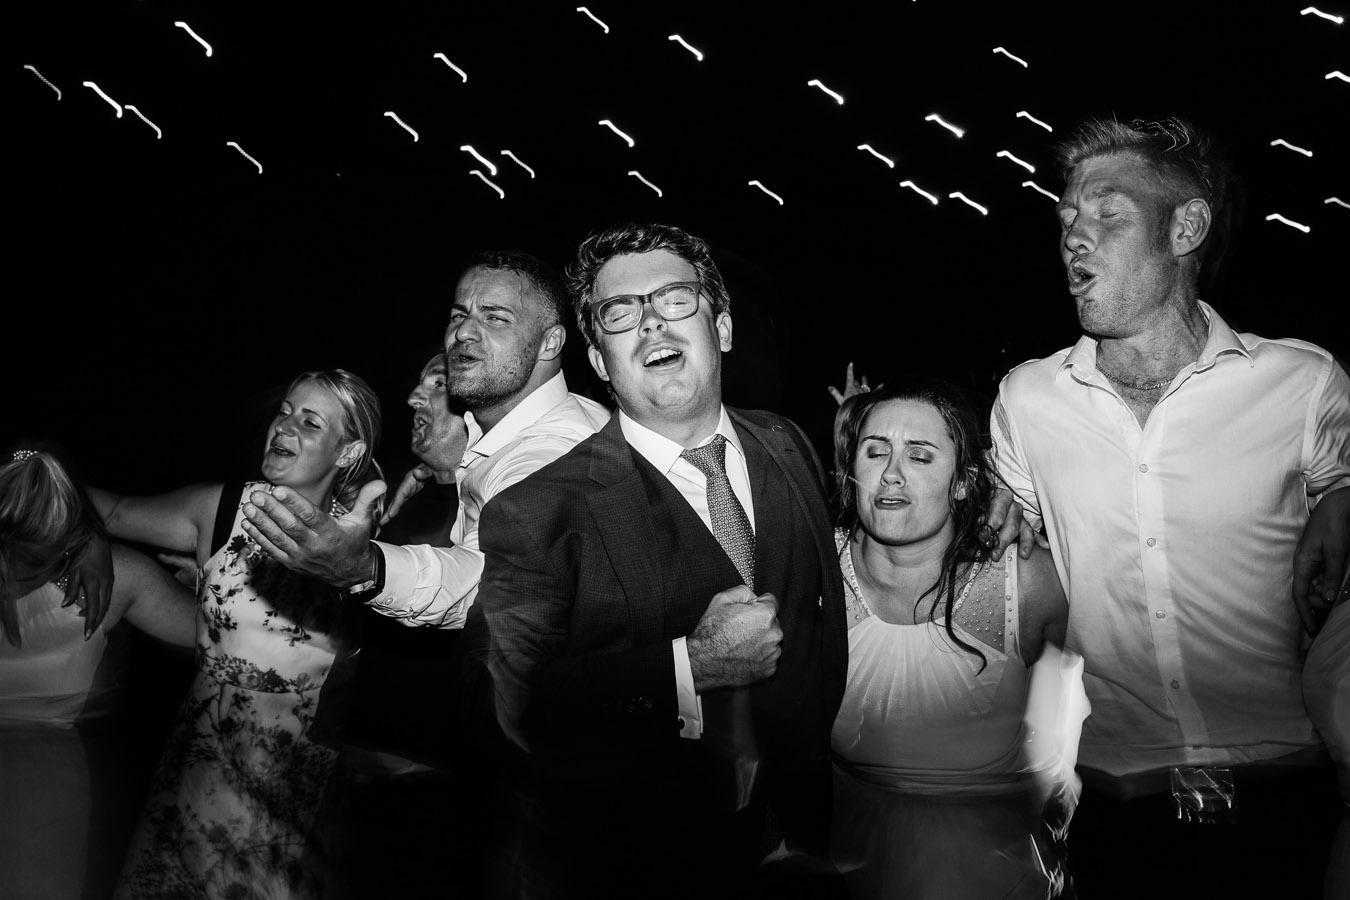 Fotograf-Tone-Tvedt-bryllup-218.jpg